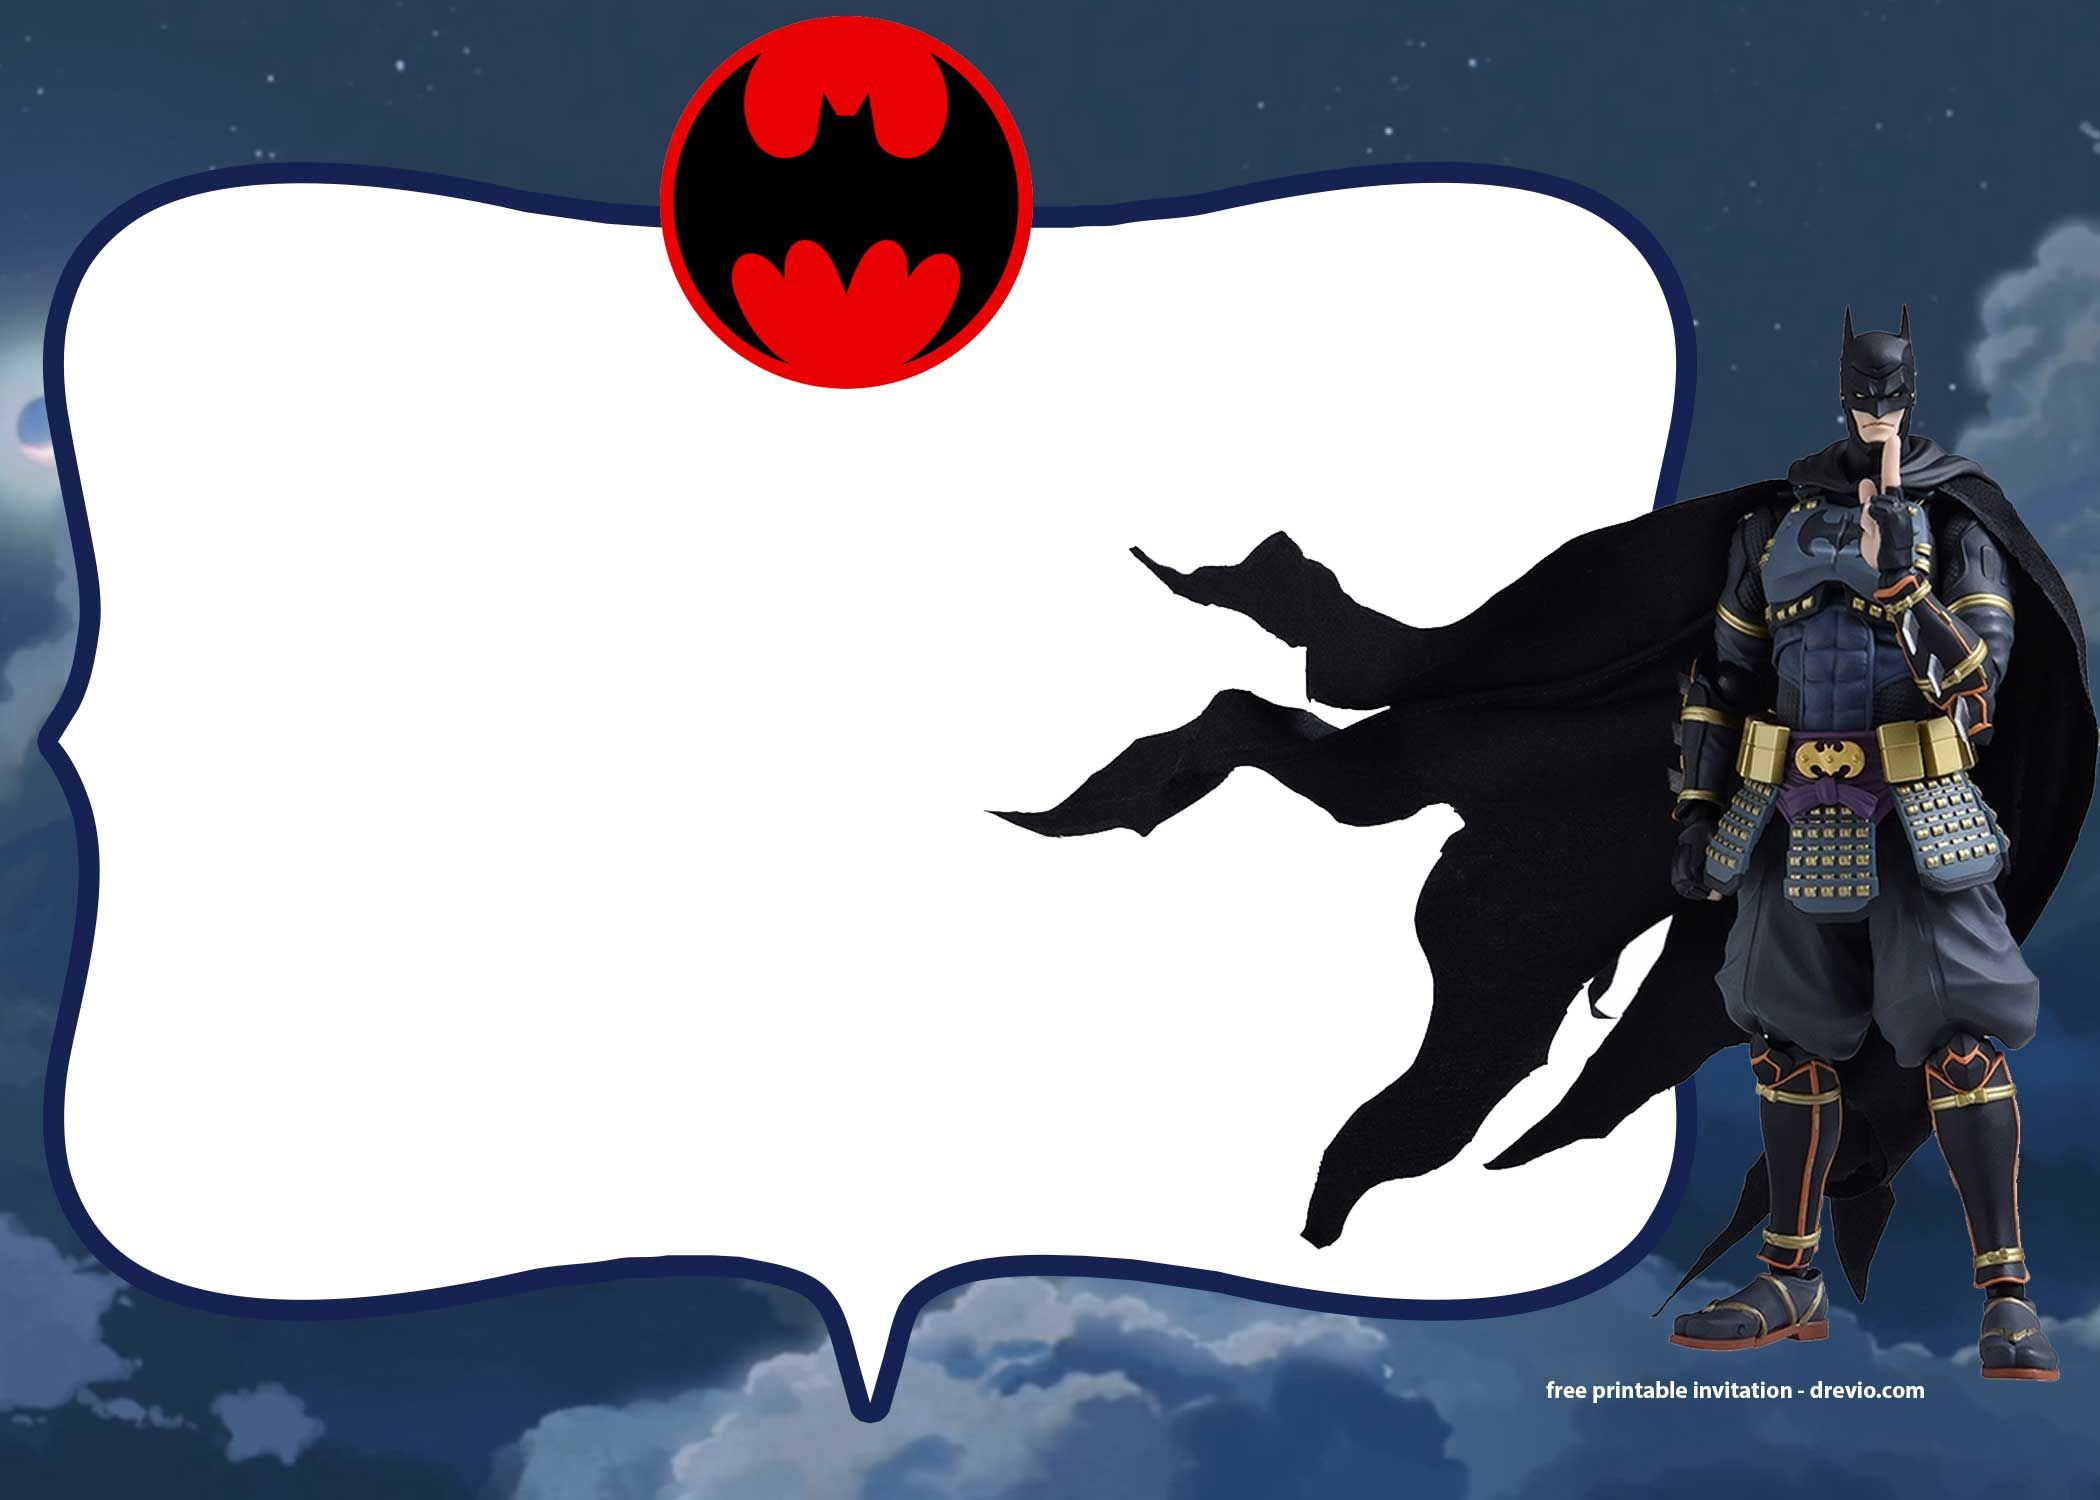 FREE Printable Batman Ninja Invitation Templates in 2018 | batman ...